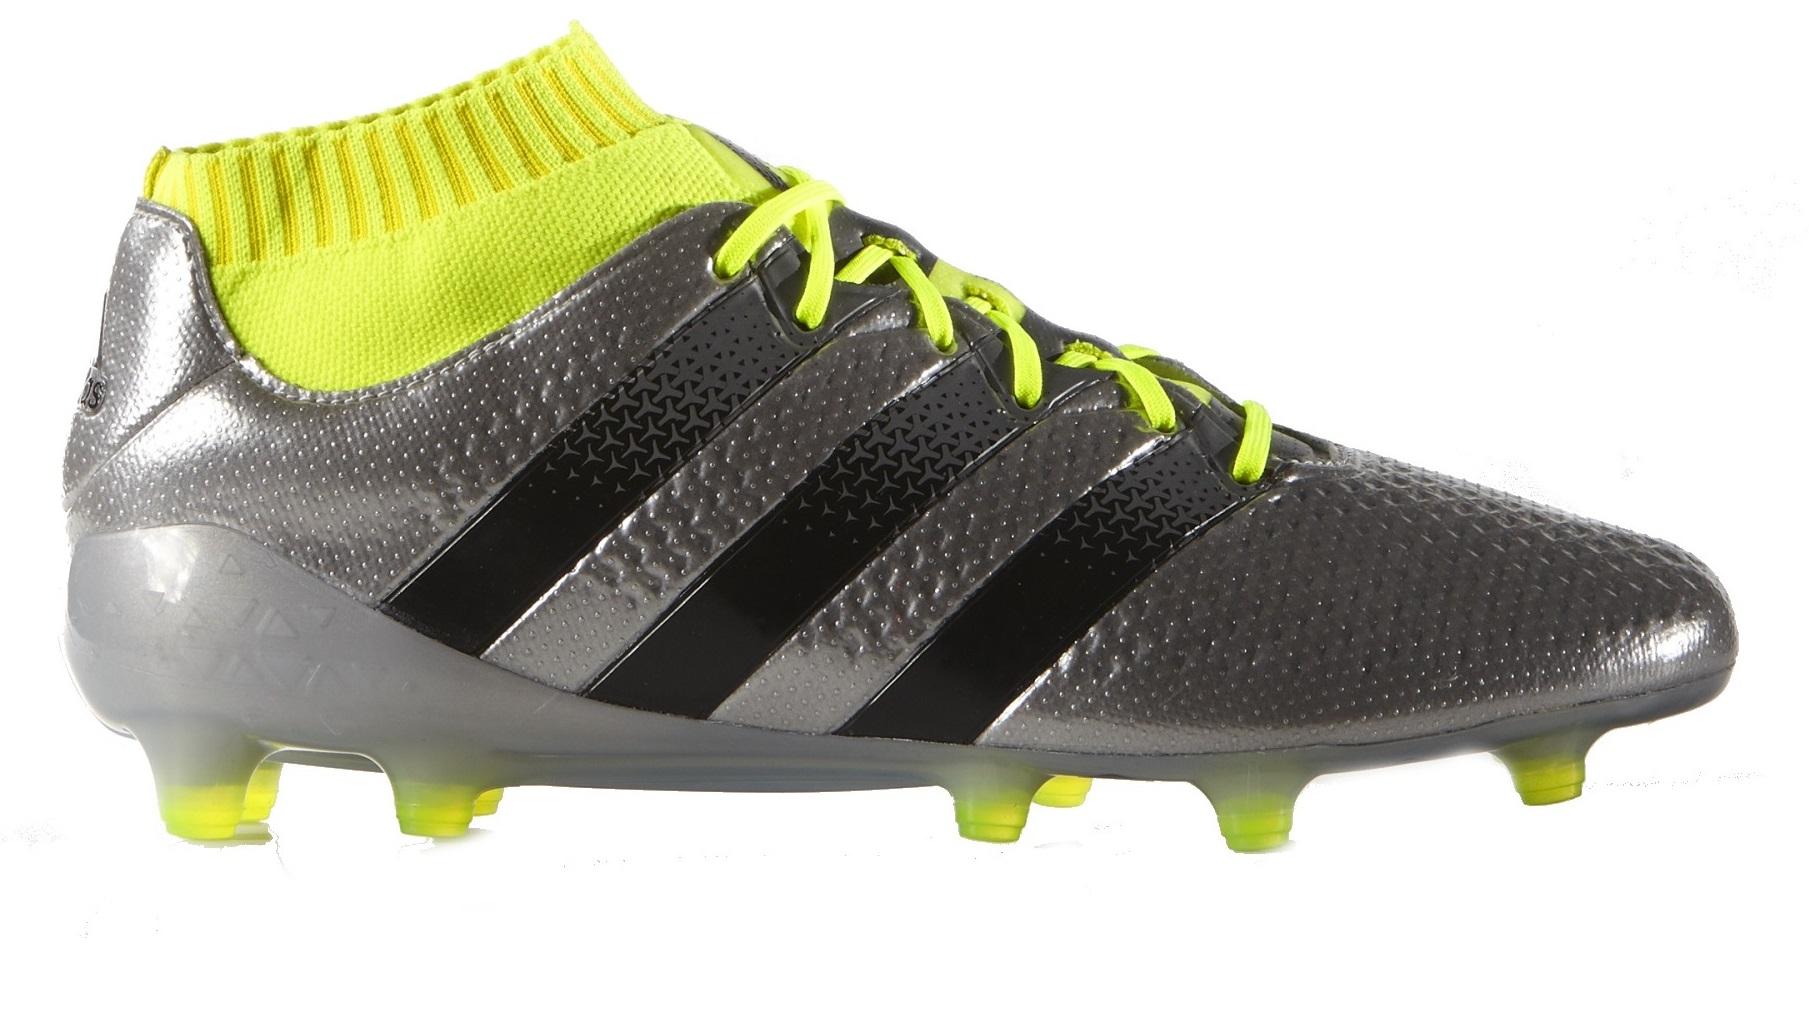 Adidas Football boots Ace 16.1 Primeknit FG